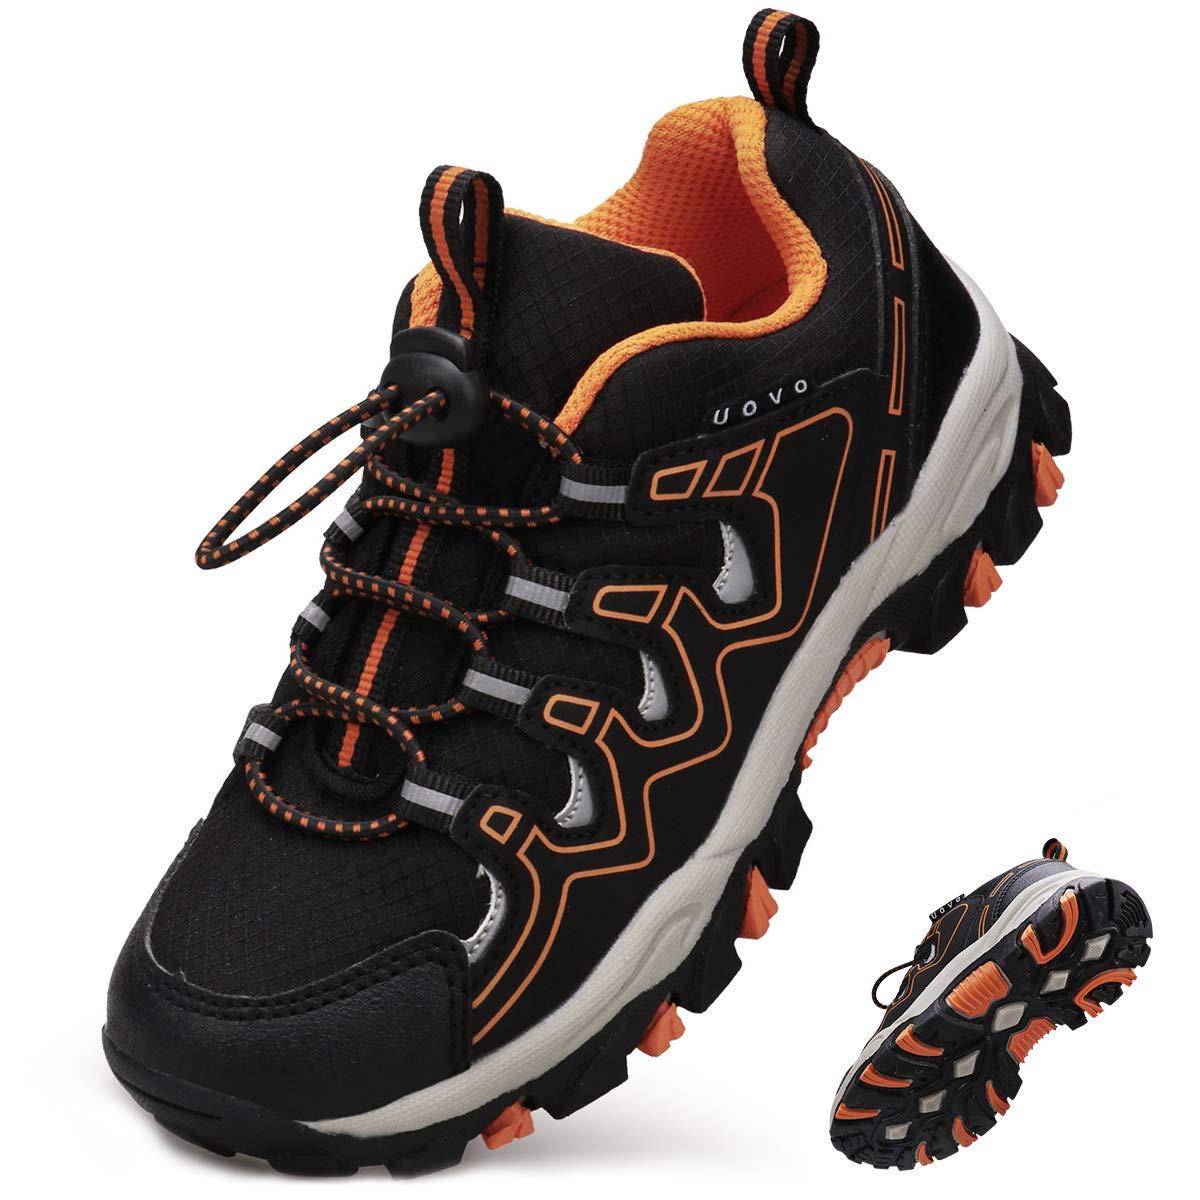 slip on boys tennis shoes